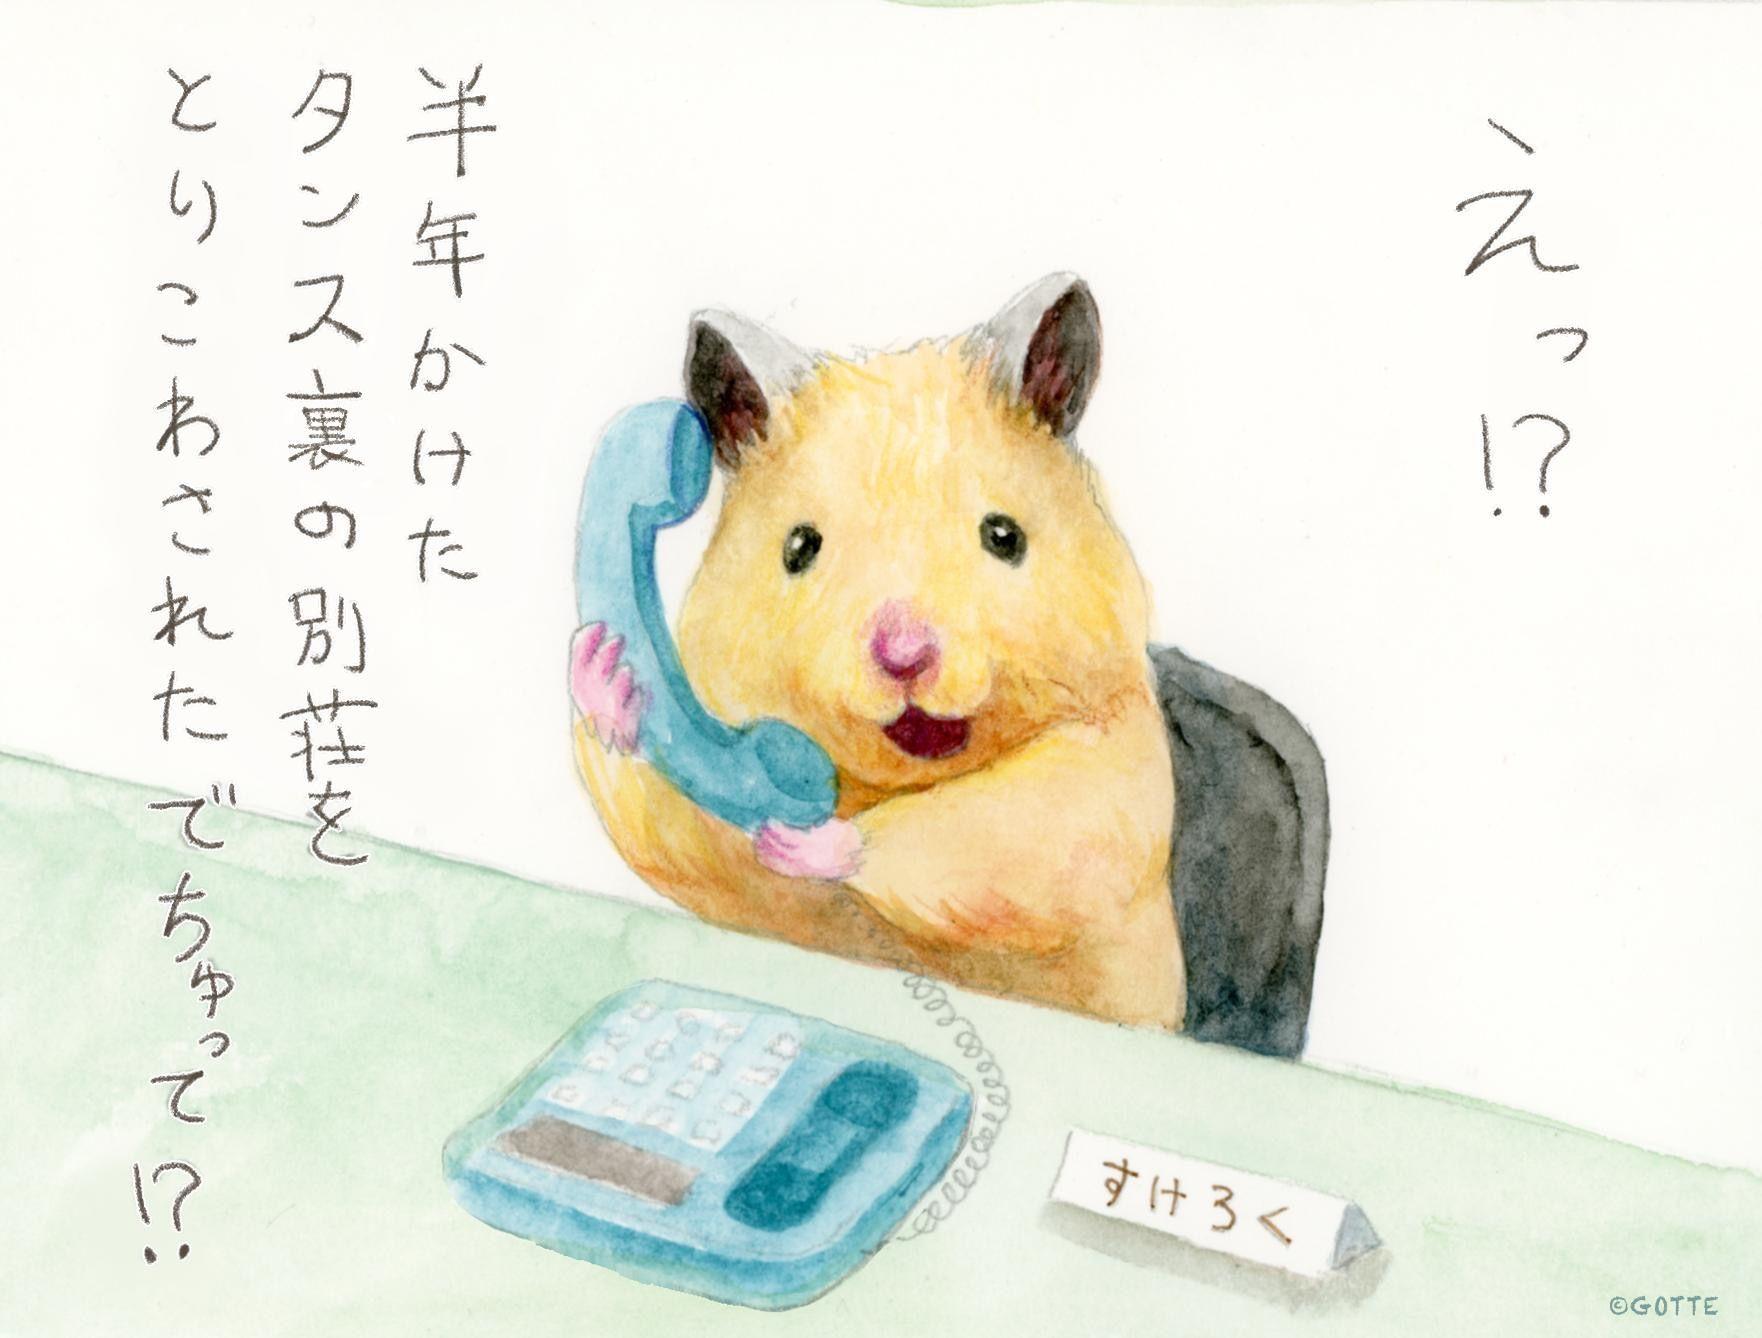 Gotte ハムスター画家 Ap Hamham Cute Hamsters Cute Baby Animals Funny Paintings